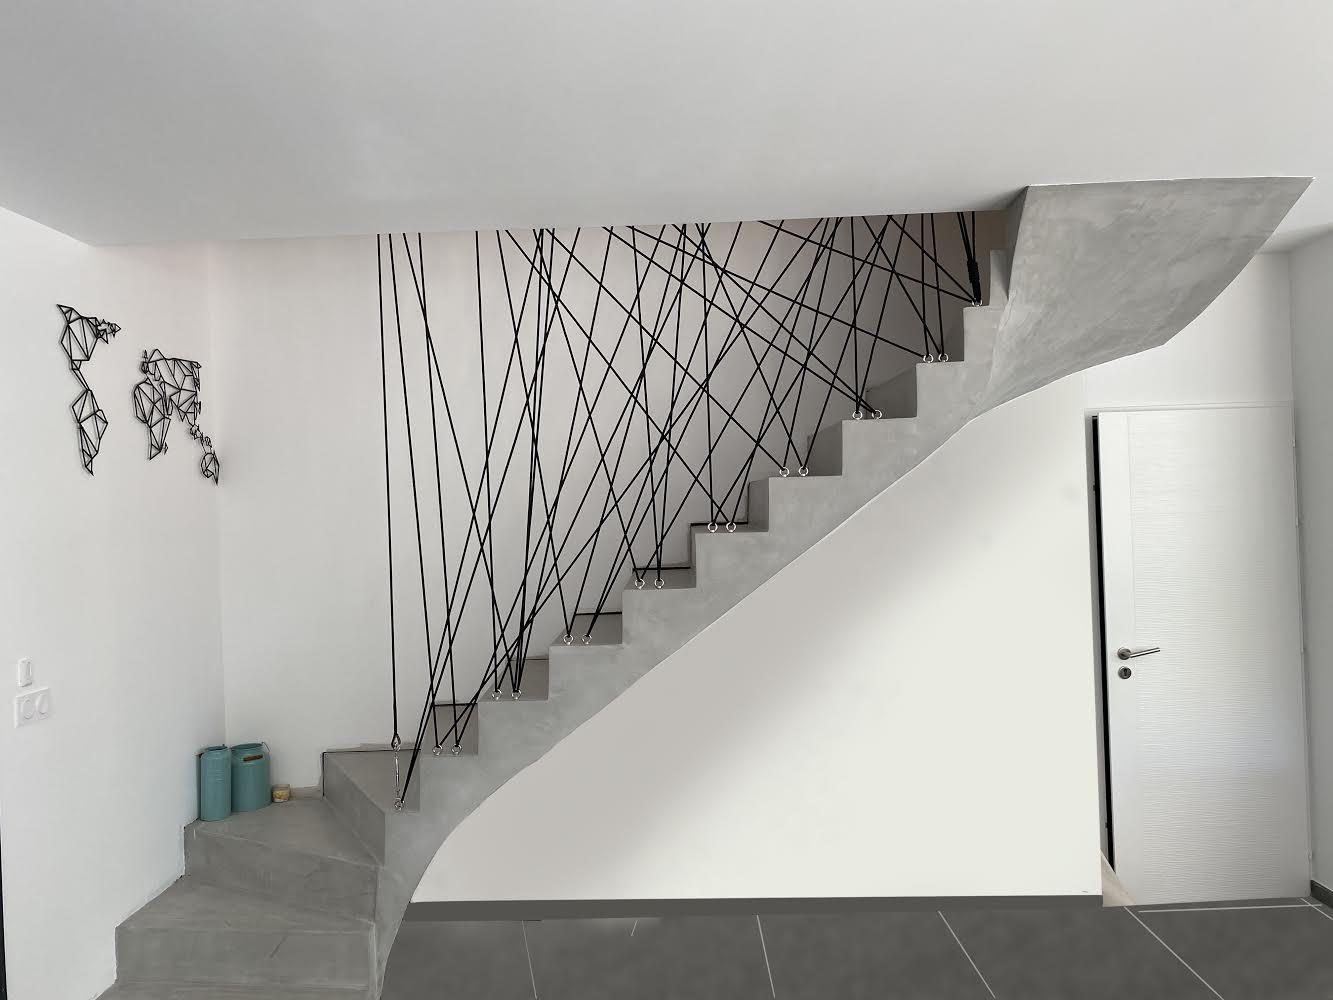 Protection en cordage d'un escalier